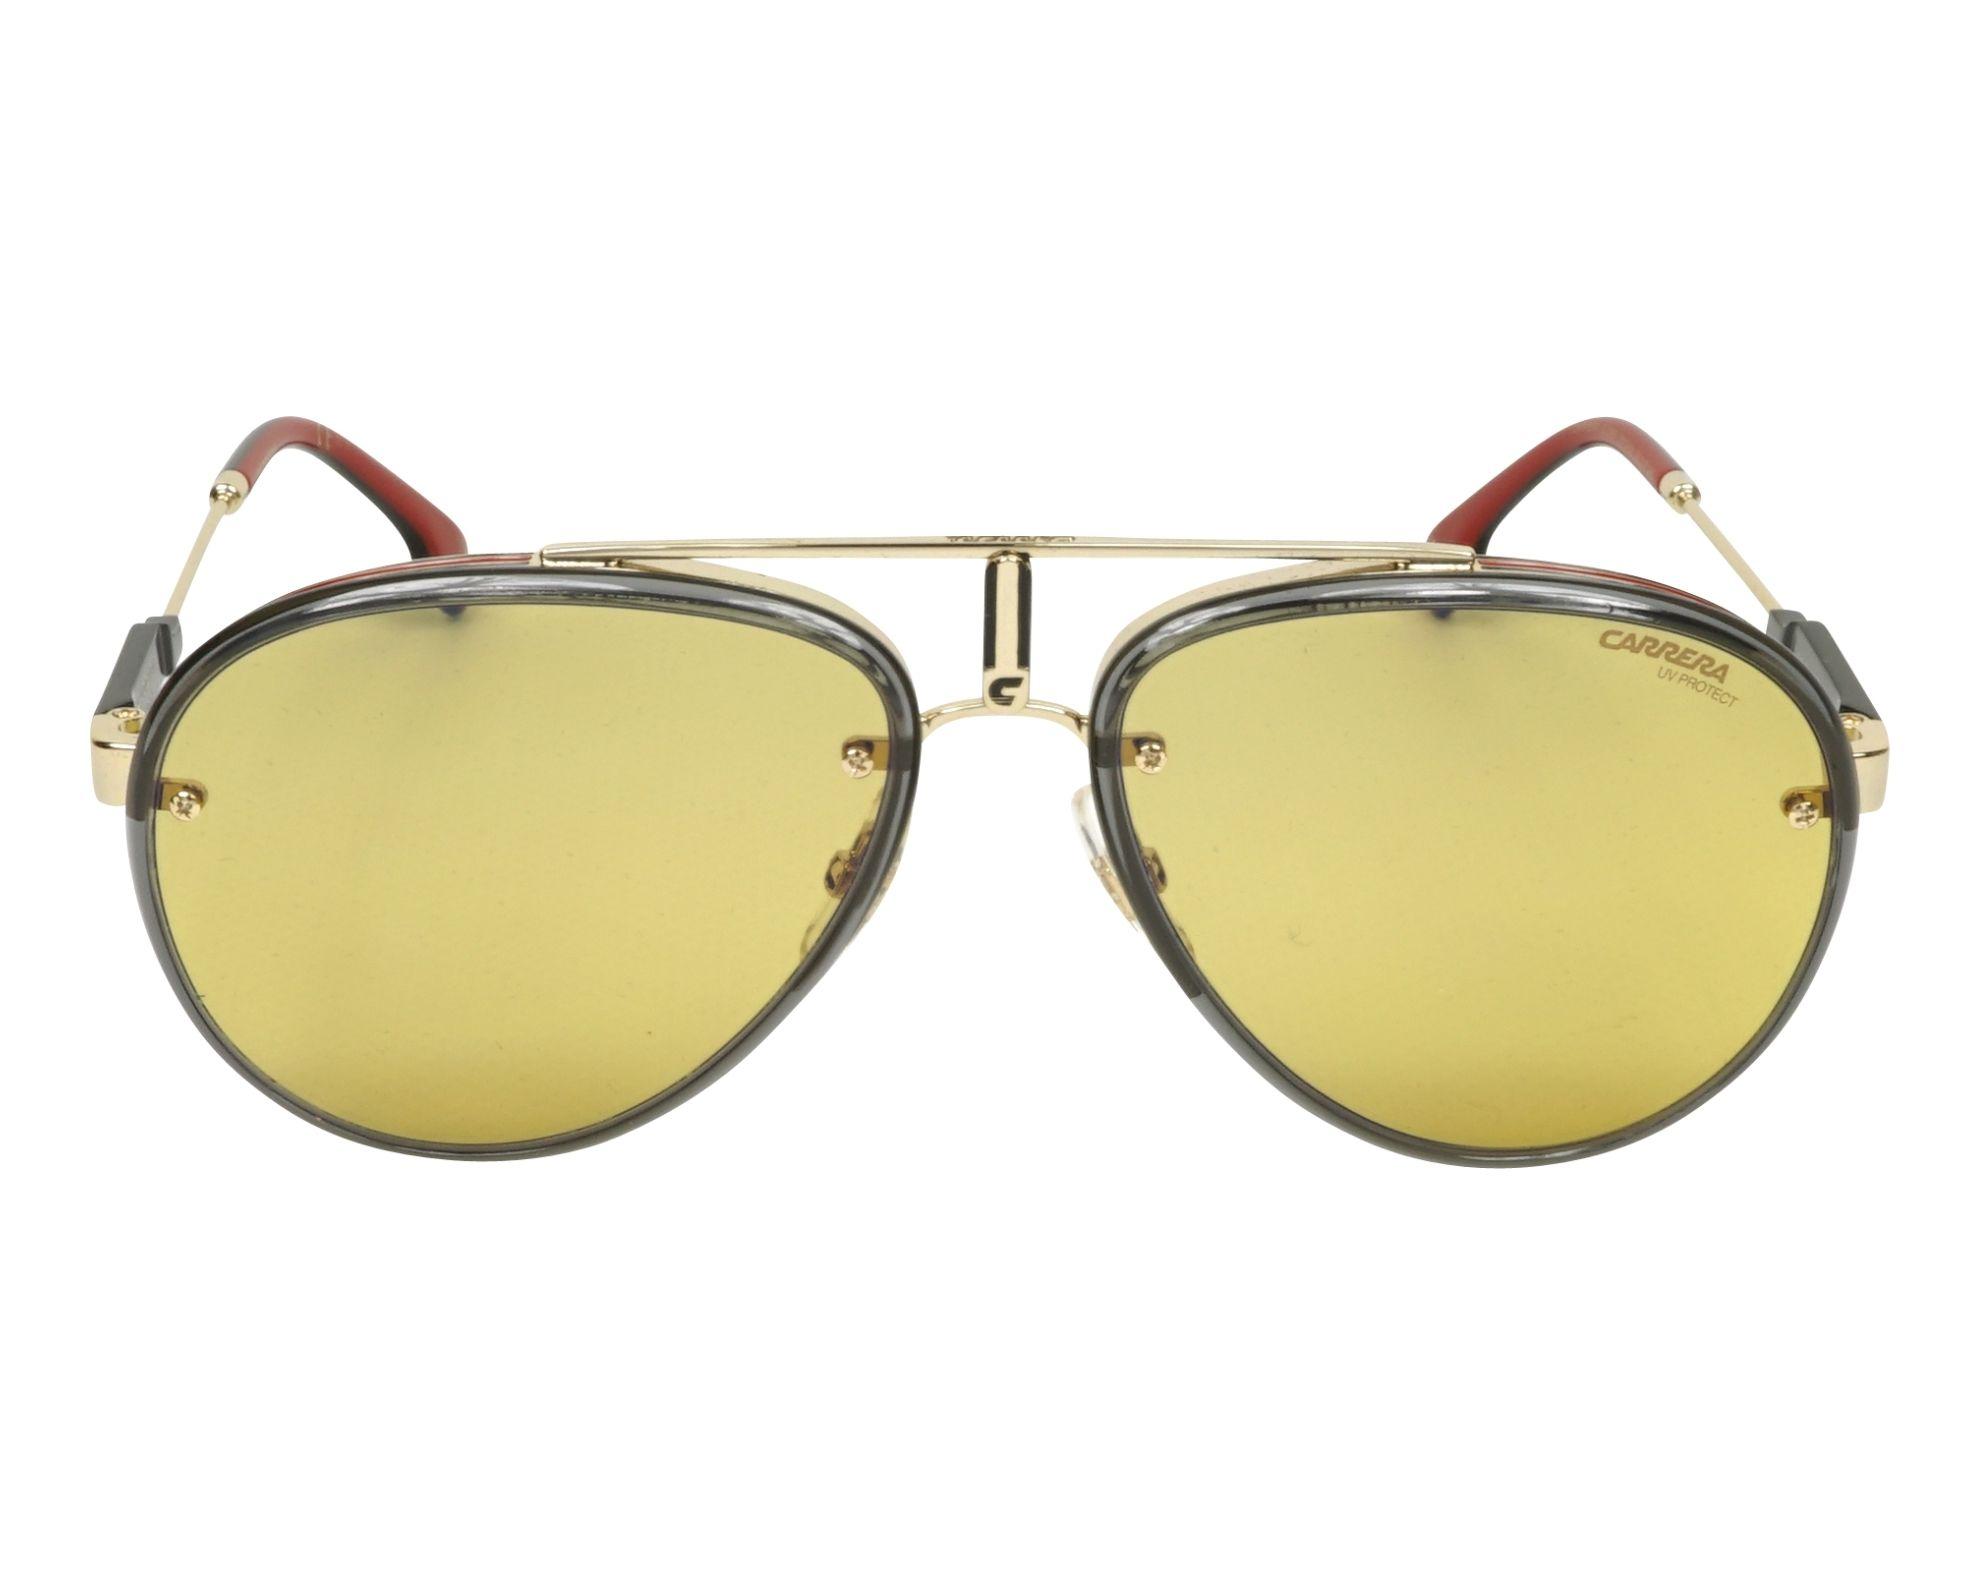 da08aea91f Sunglasses Carrera GLORY DYG HW 58-17 Gold Grey front view